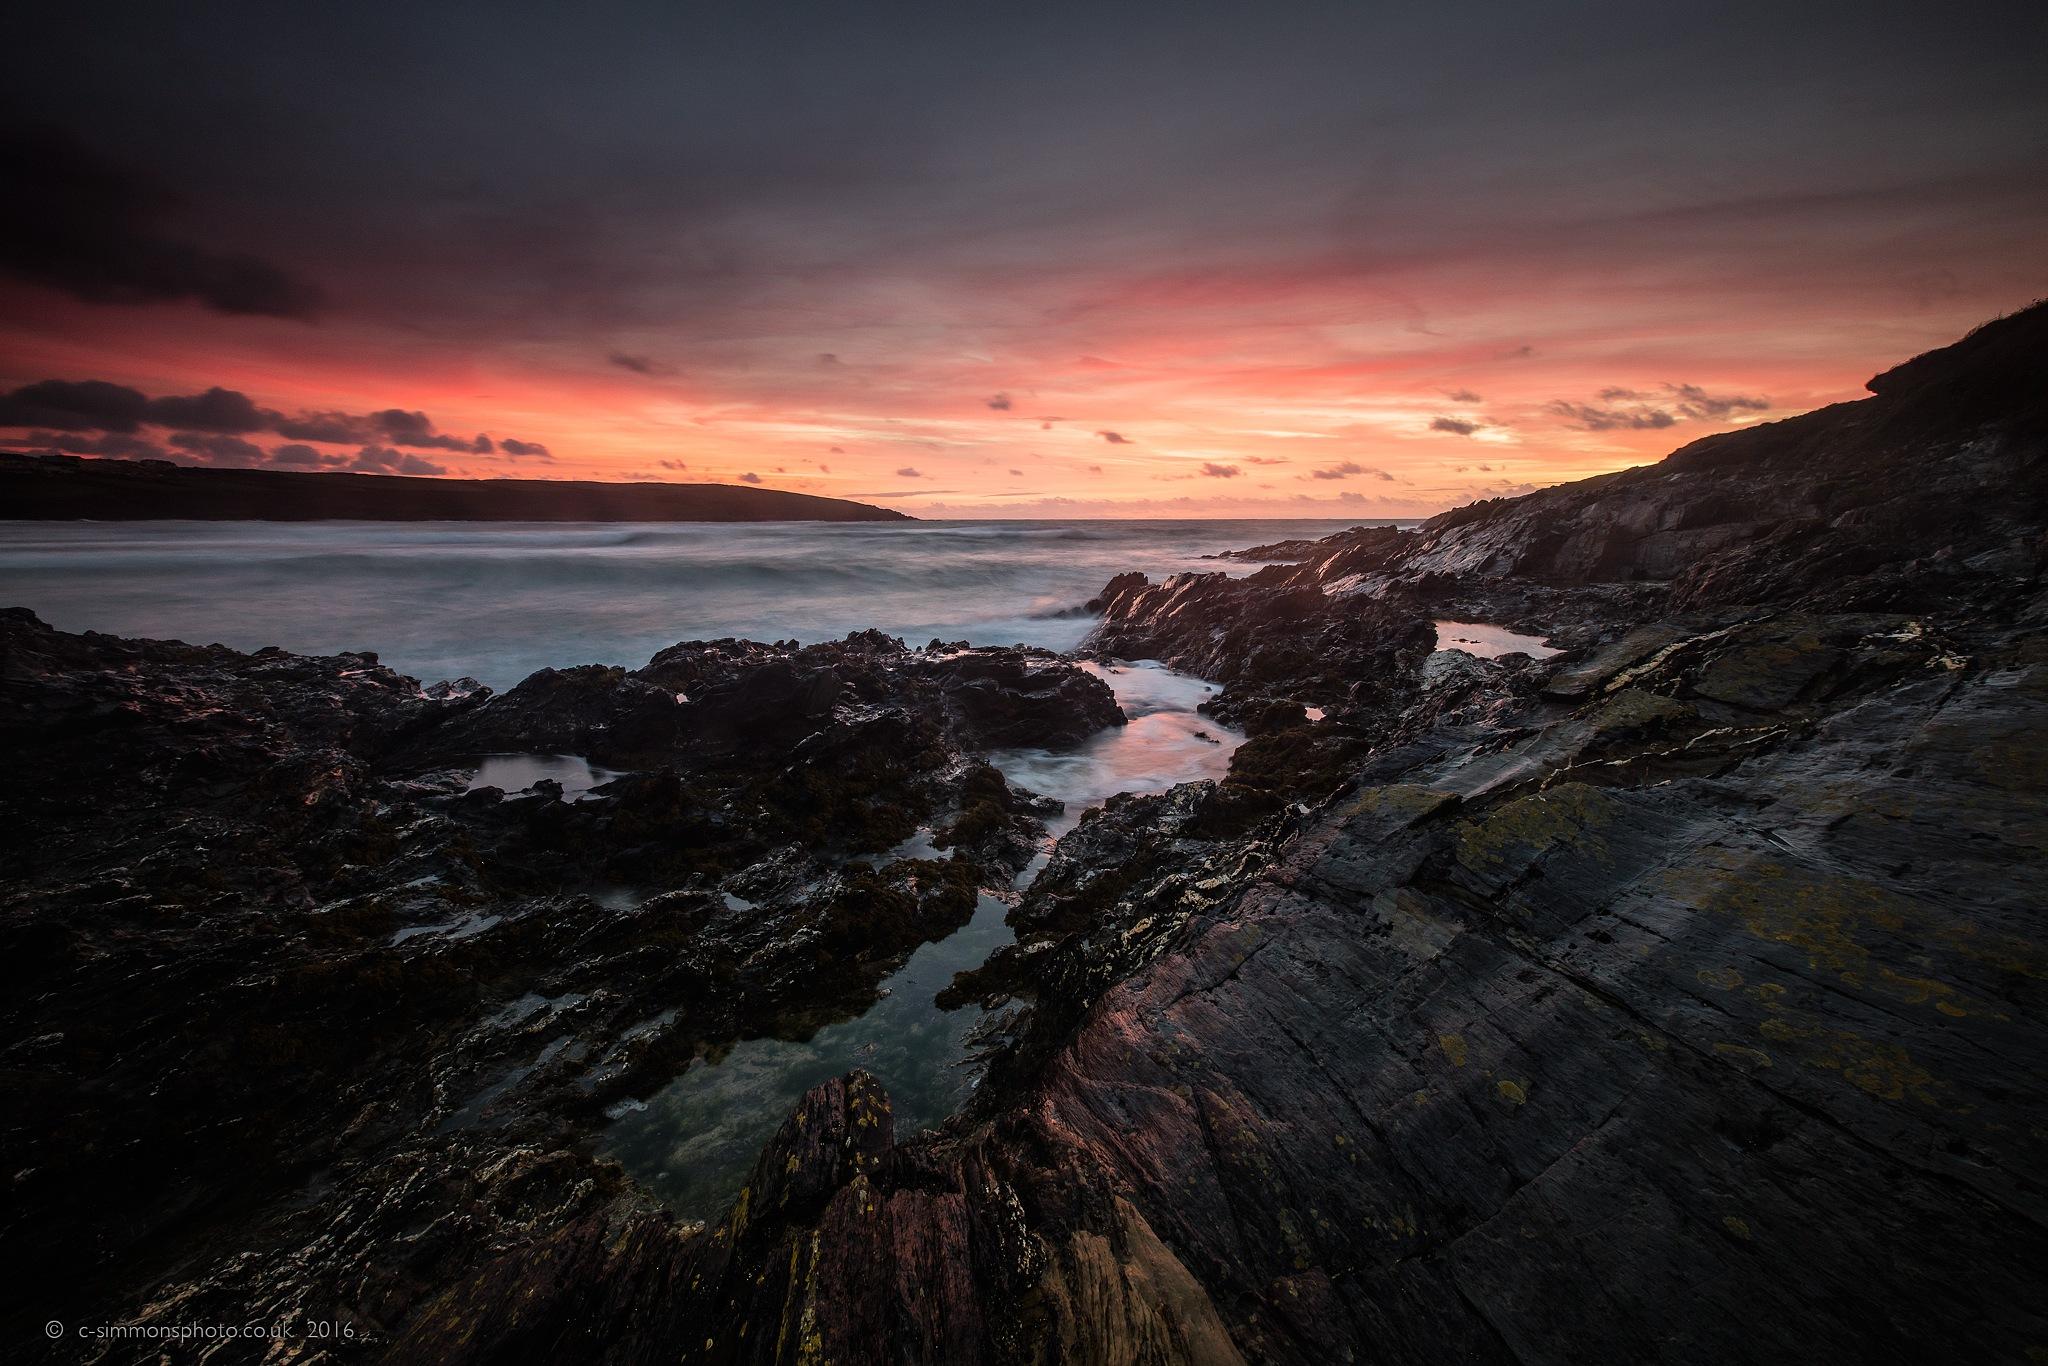 Crantock Ledge Amber Sundown by Chris Simmons Photography